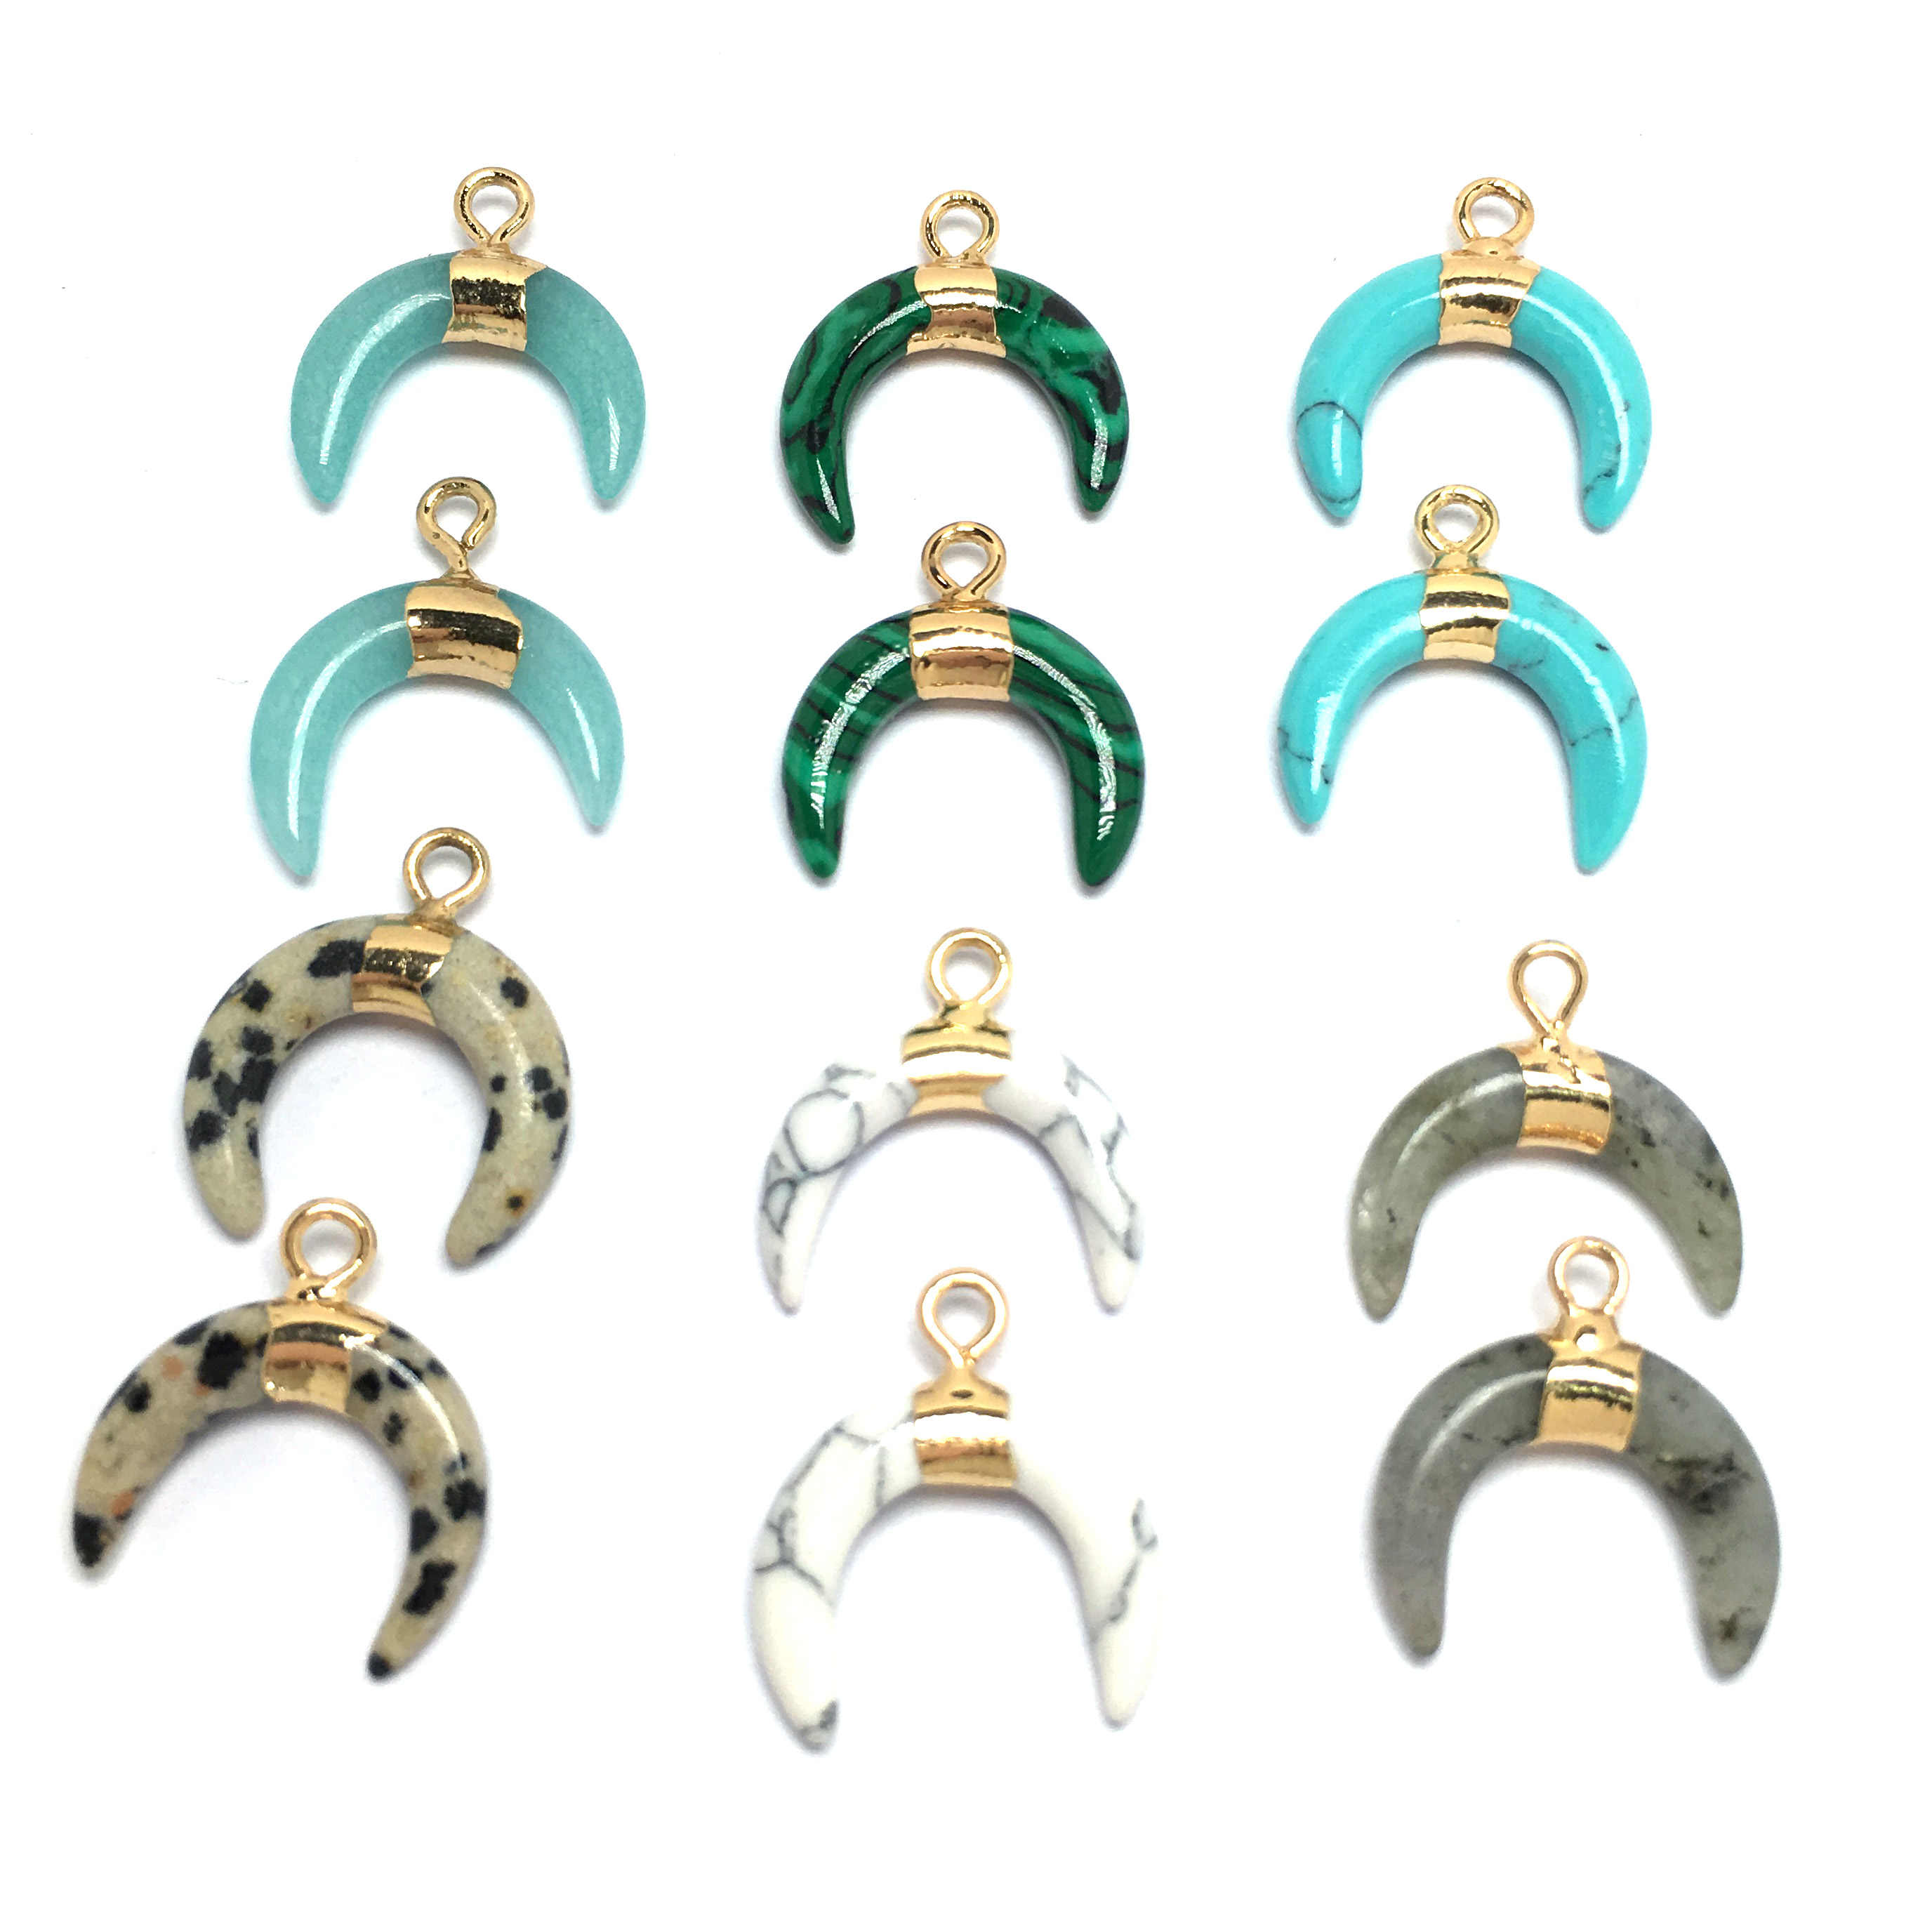 Sıcak satış ay şekli doğal taş kolye kolye Charms kolye takı yapma malzemeleri Fit kolye 16x17mm